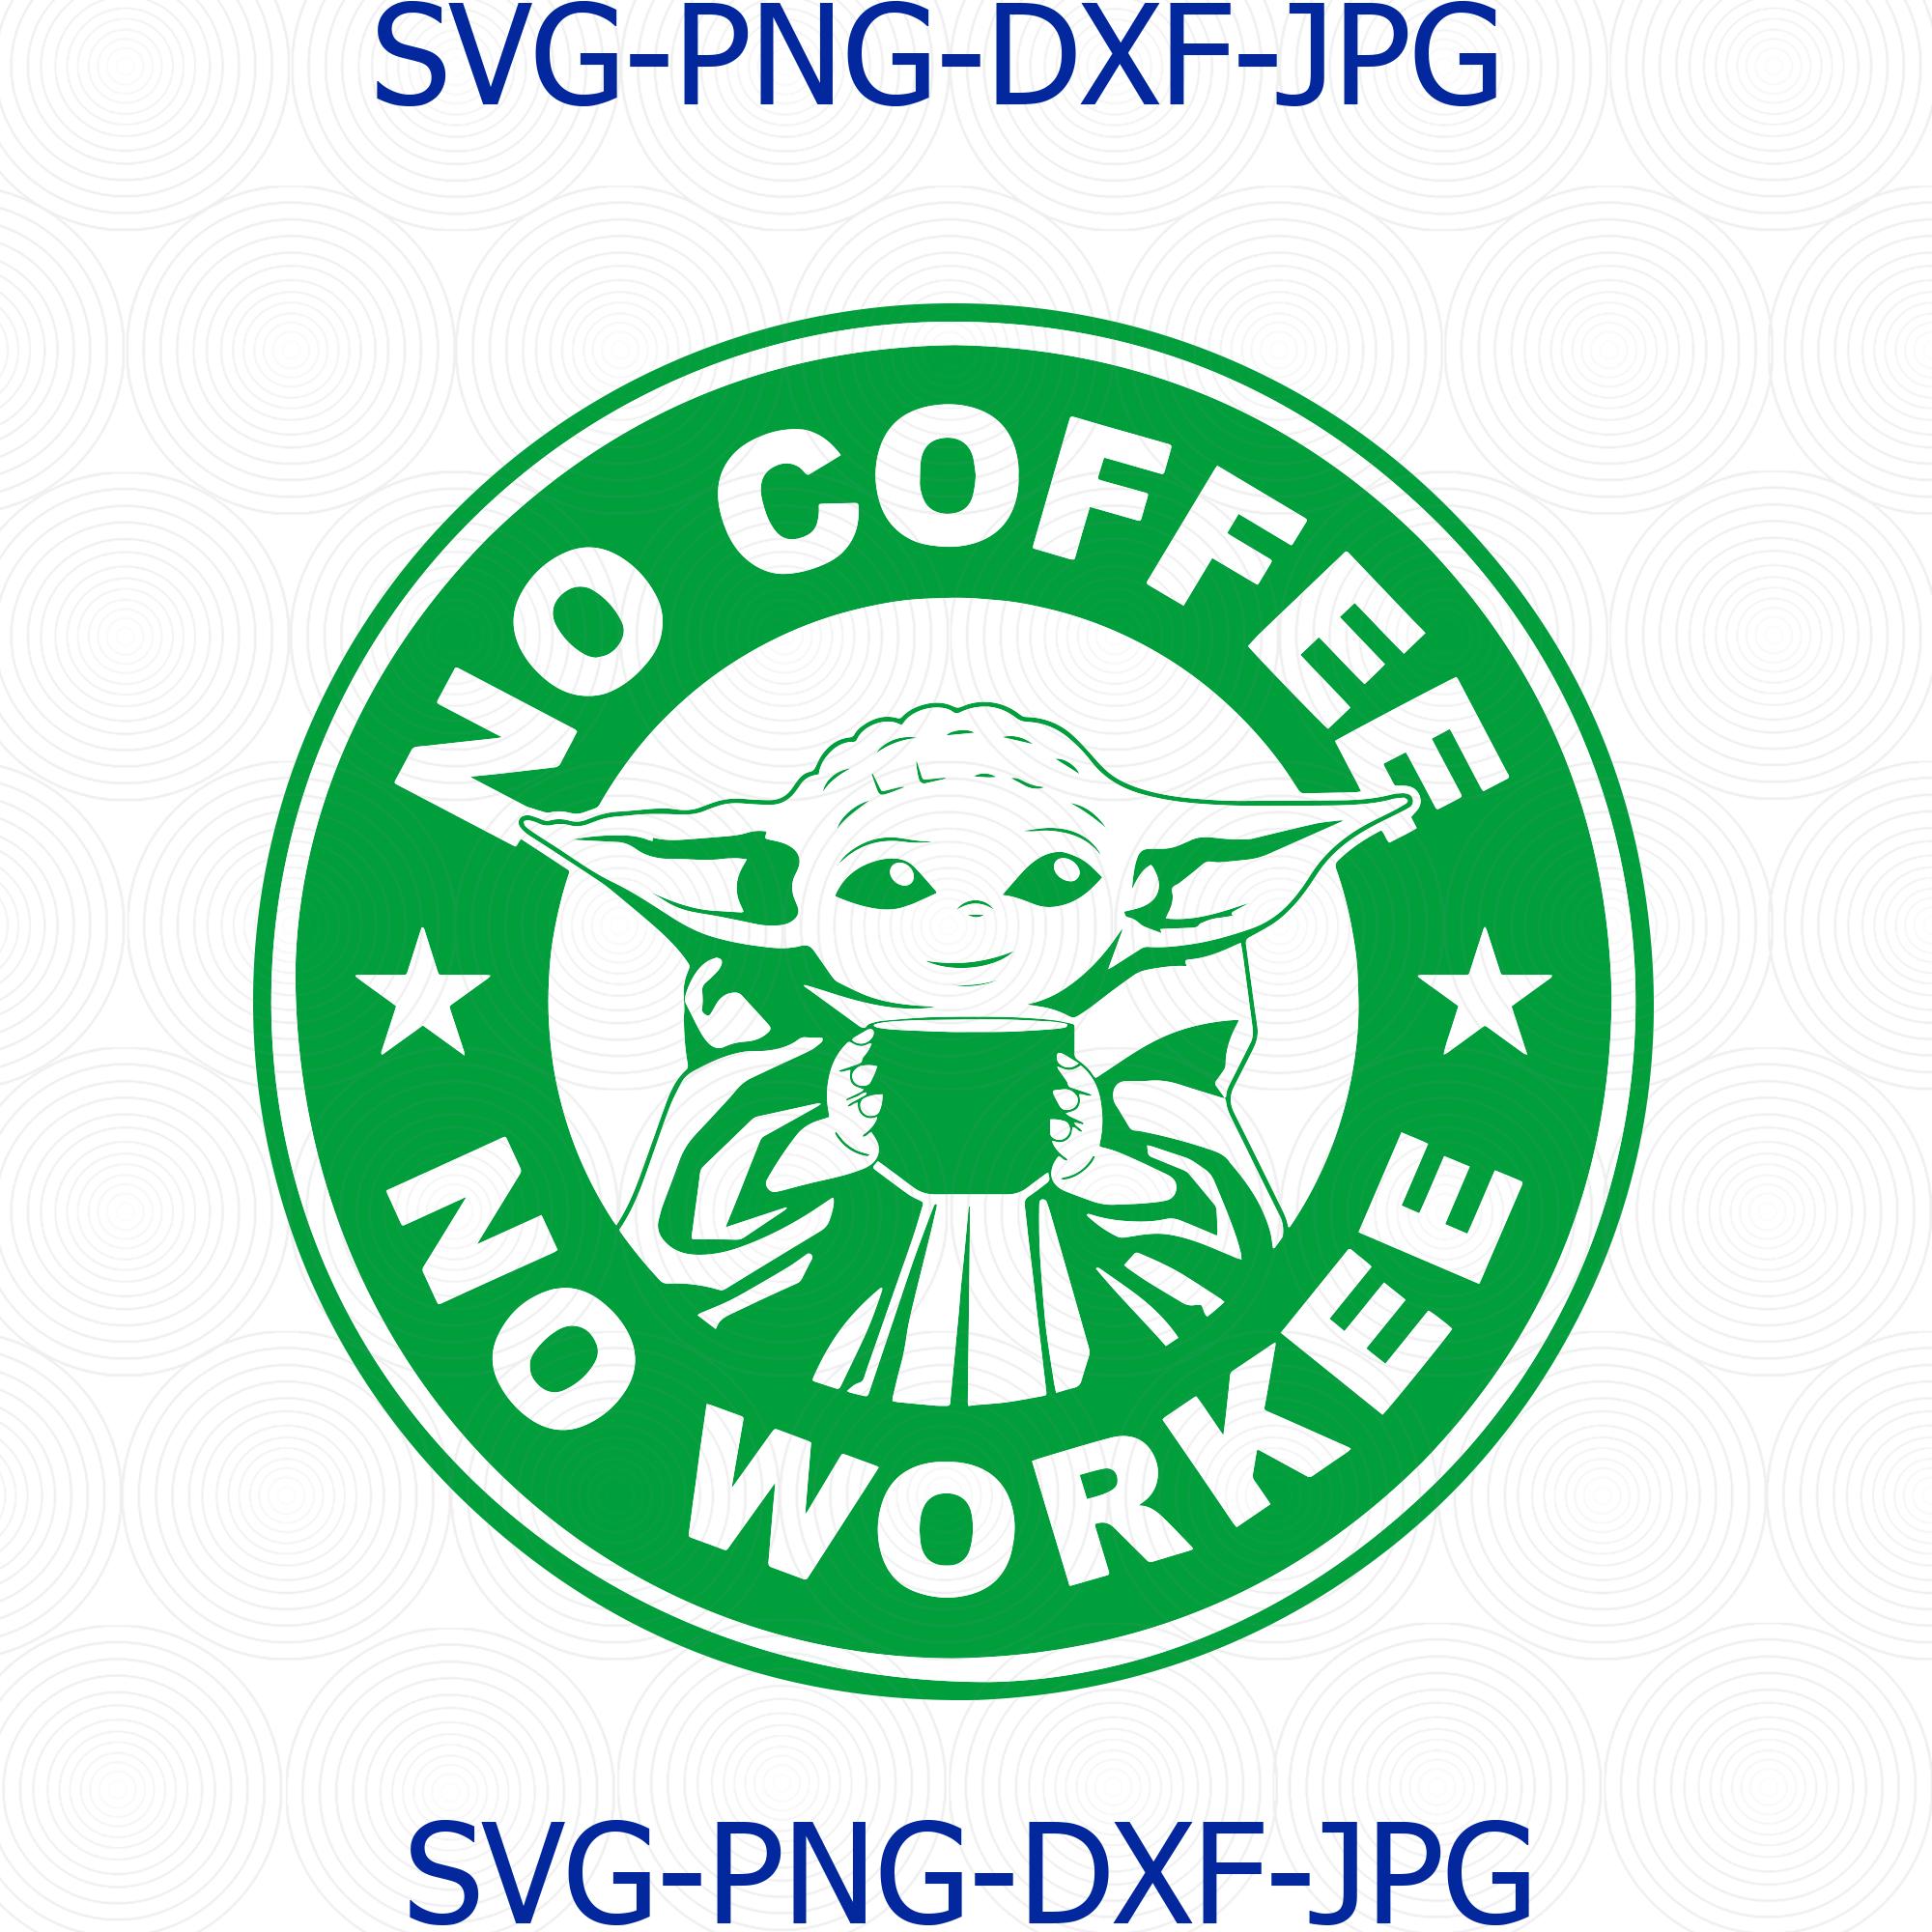 Baby Yoda Coffee Starbucks Svg Baby Yoda No By Digital4u On Zibbet